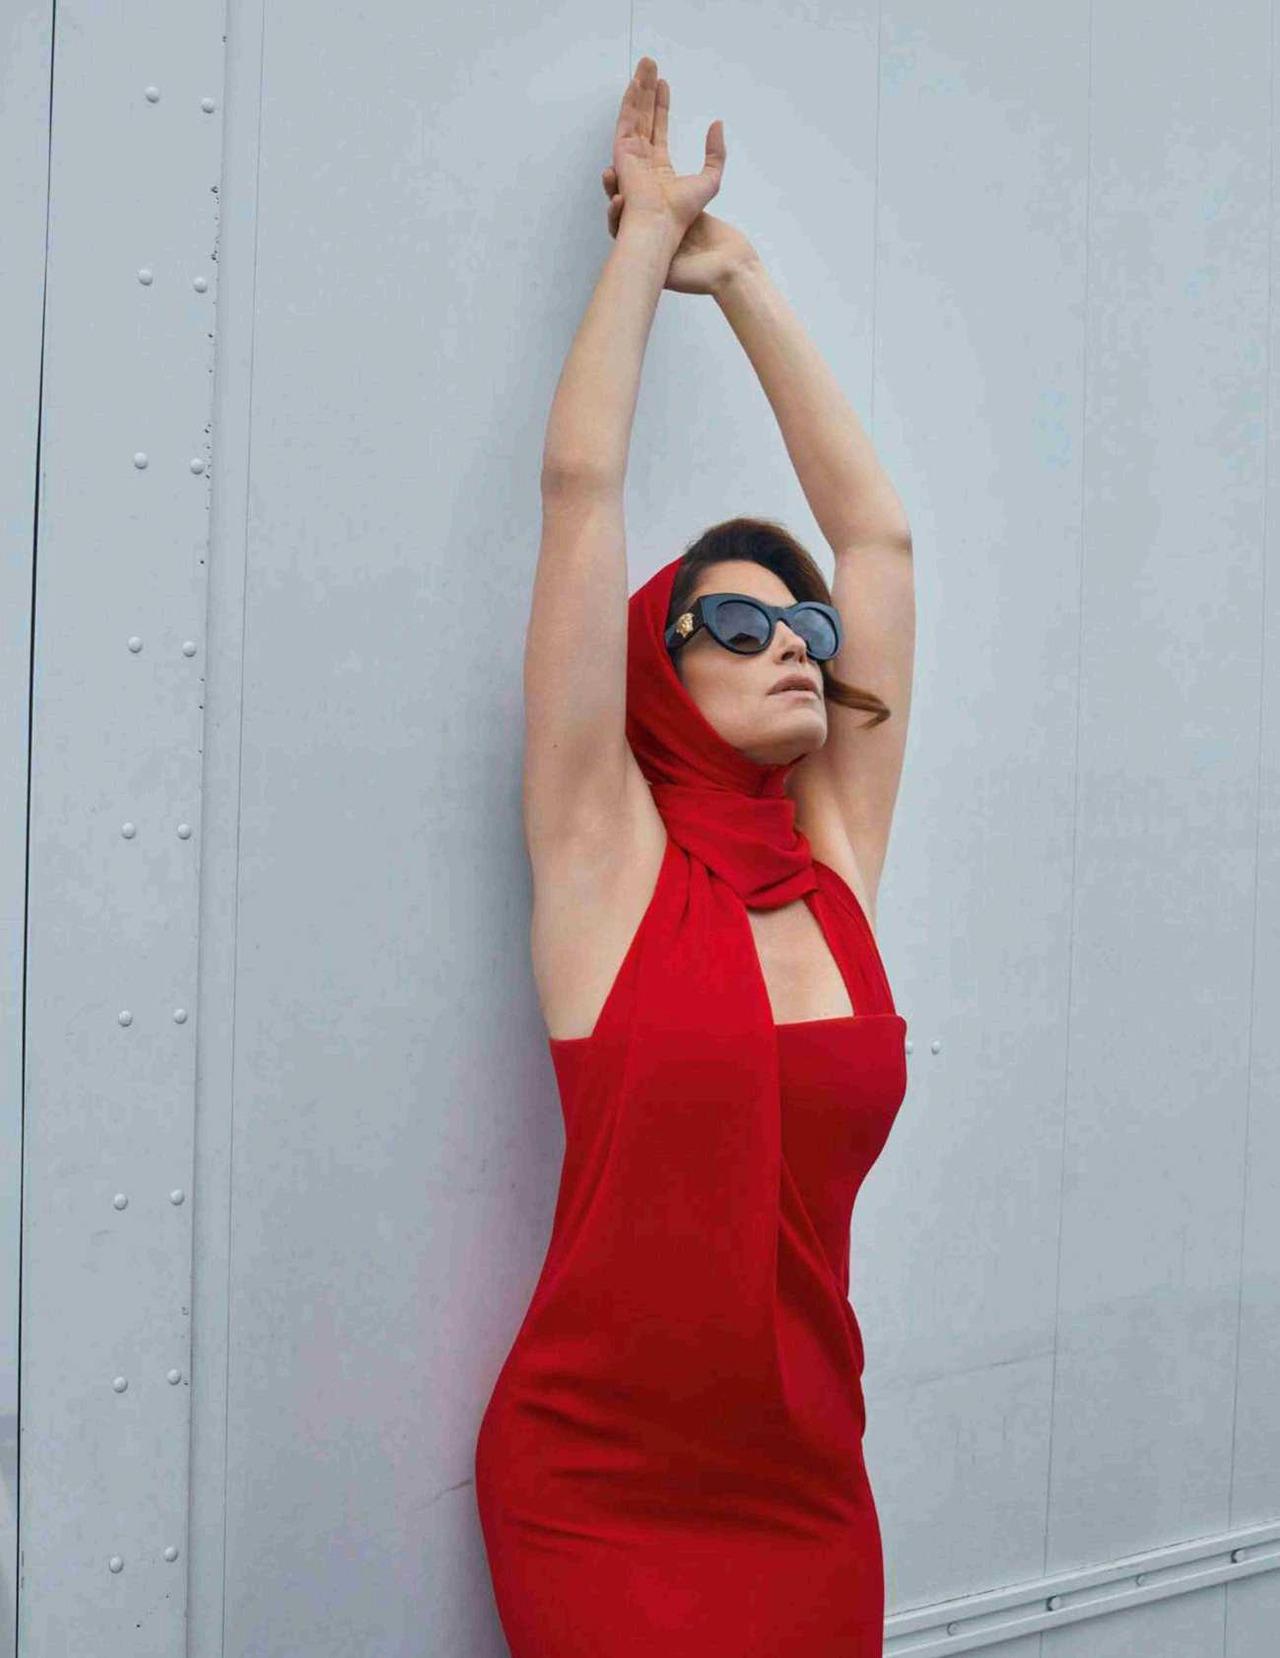 Cindy Crawford by Sebastian Faena for Vogue Spain Oct 2018 (2).jpg